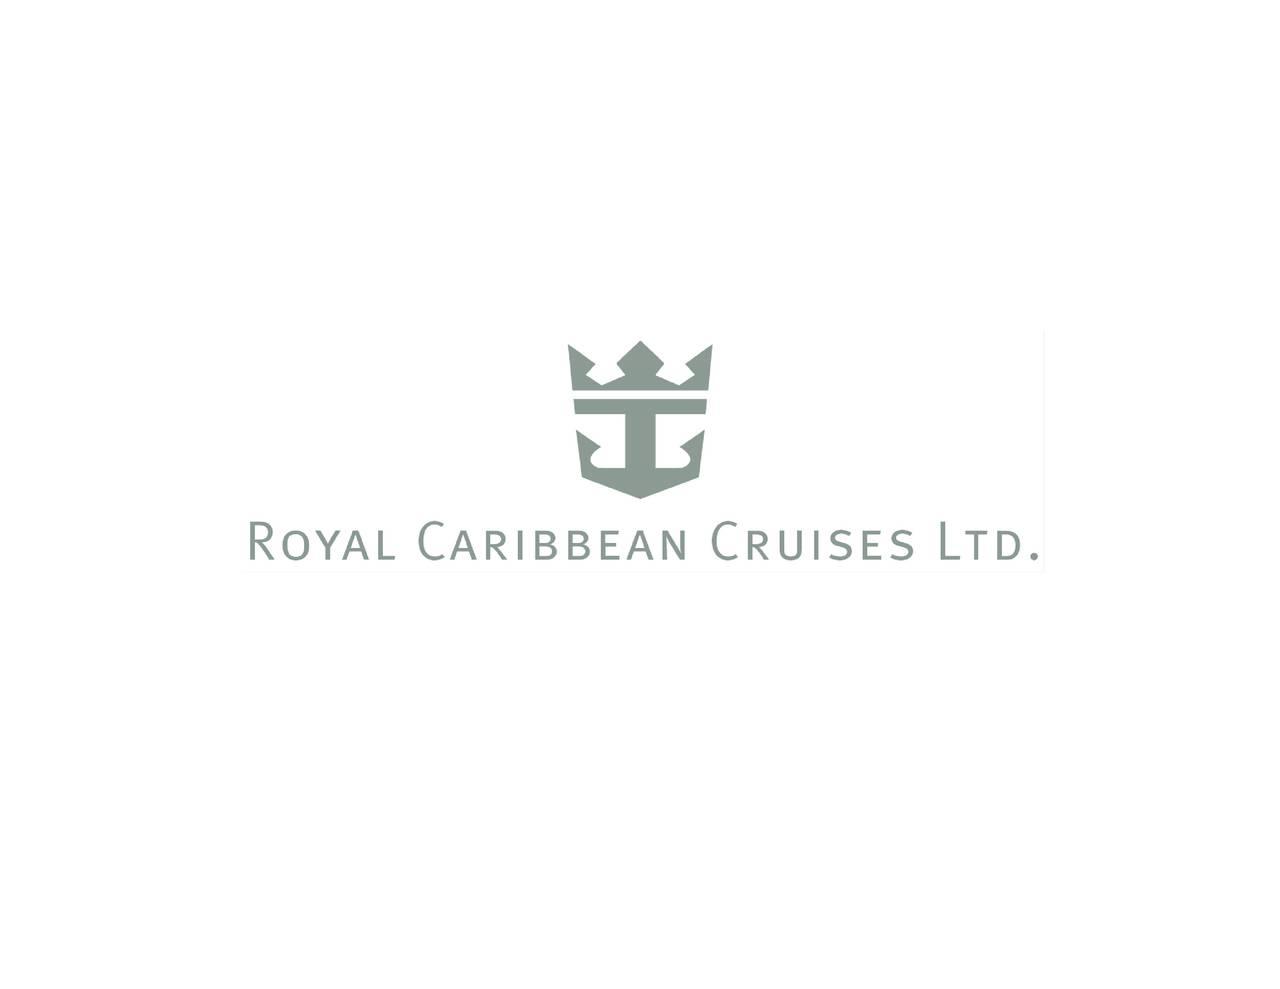 Royal Caribbean Cruises Ltd. 2017 Q2